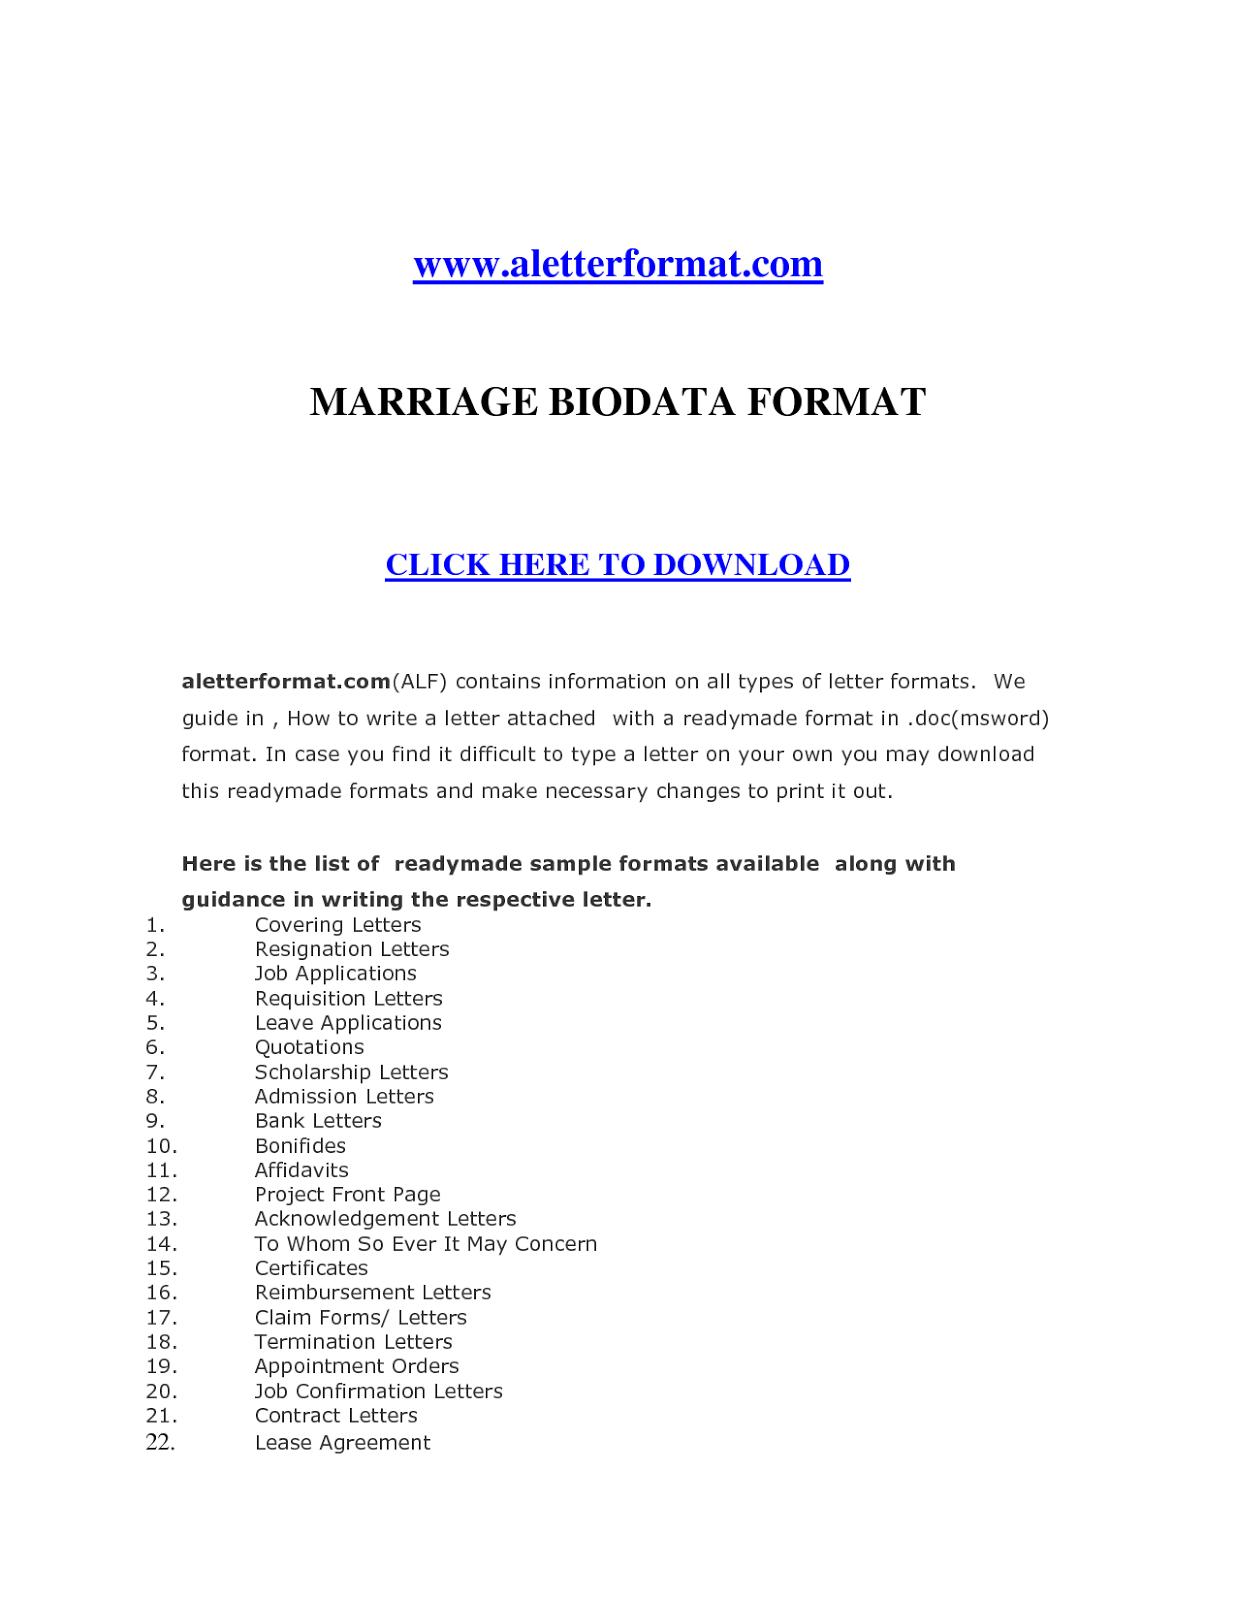 marriage resume format marriage resume format for girl in word marriage resume format for boy marriage resume format for girl marriage resume format doc marriage resume format in marathi